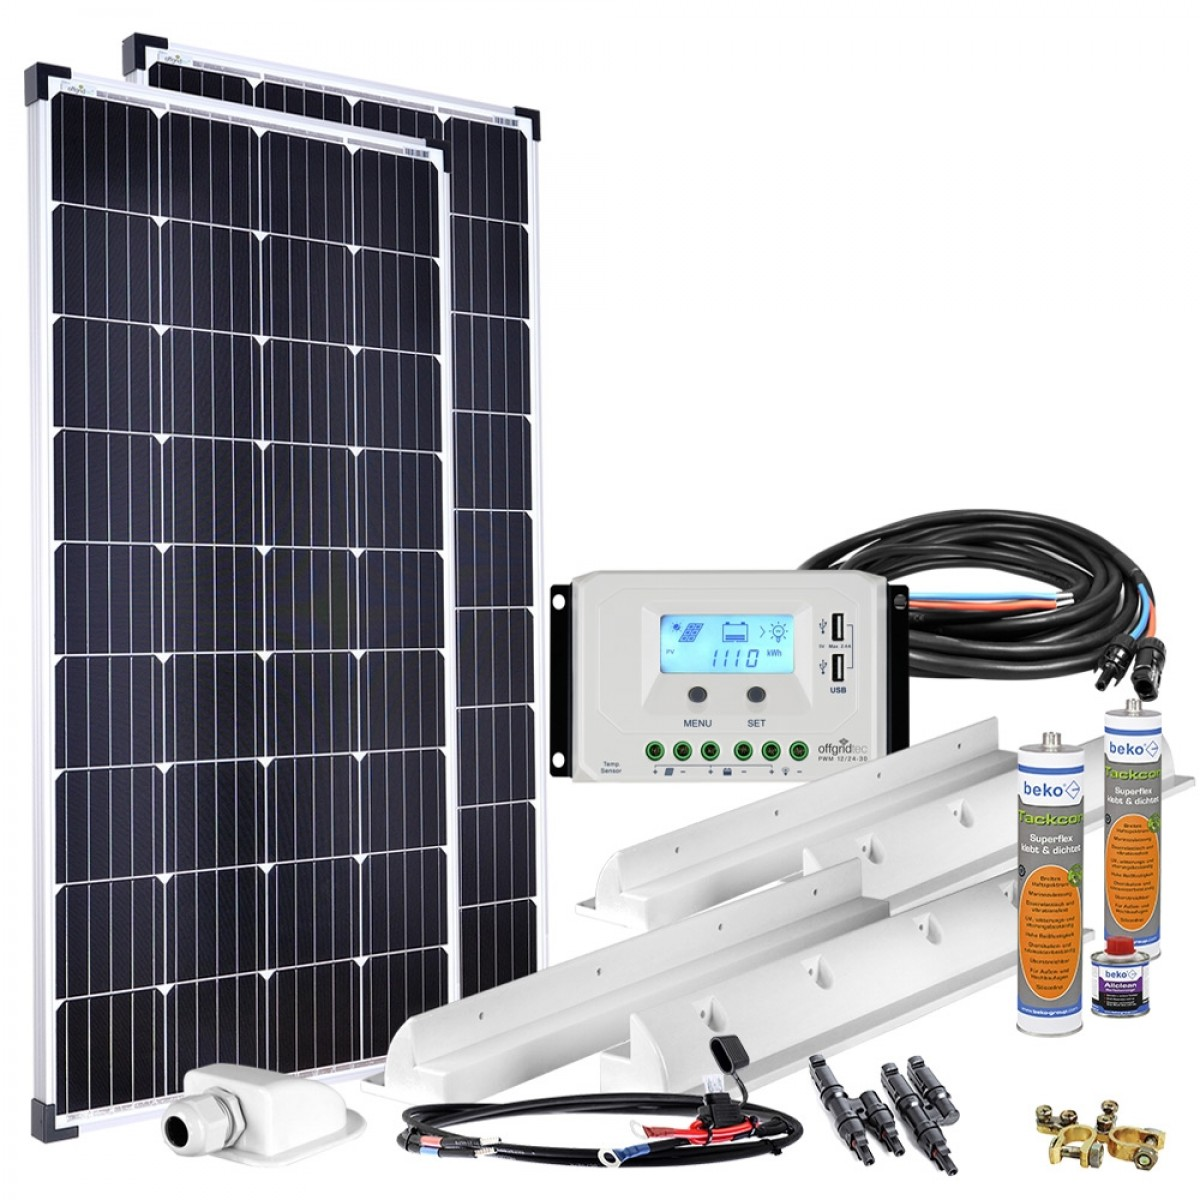 10W Premium-XL Wohnmobil Solaranlage 10V Offgridtec